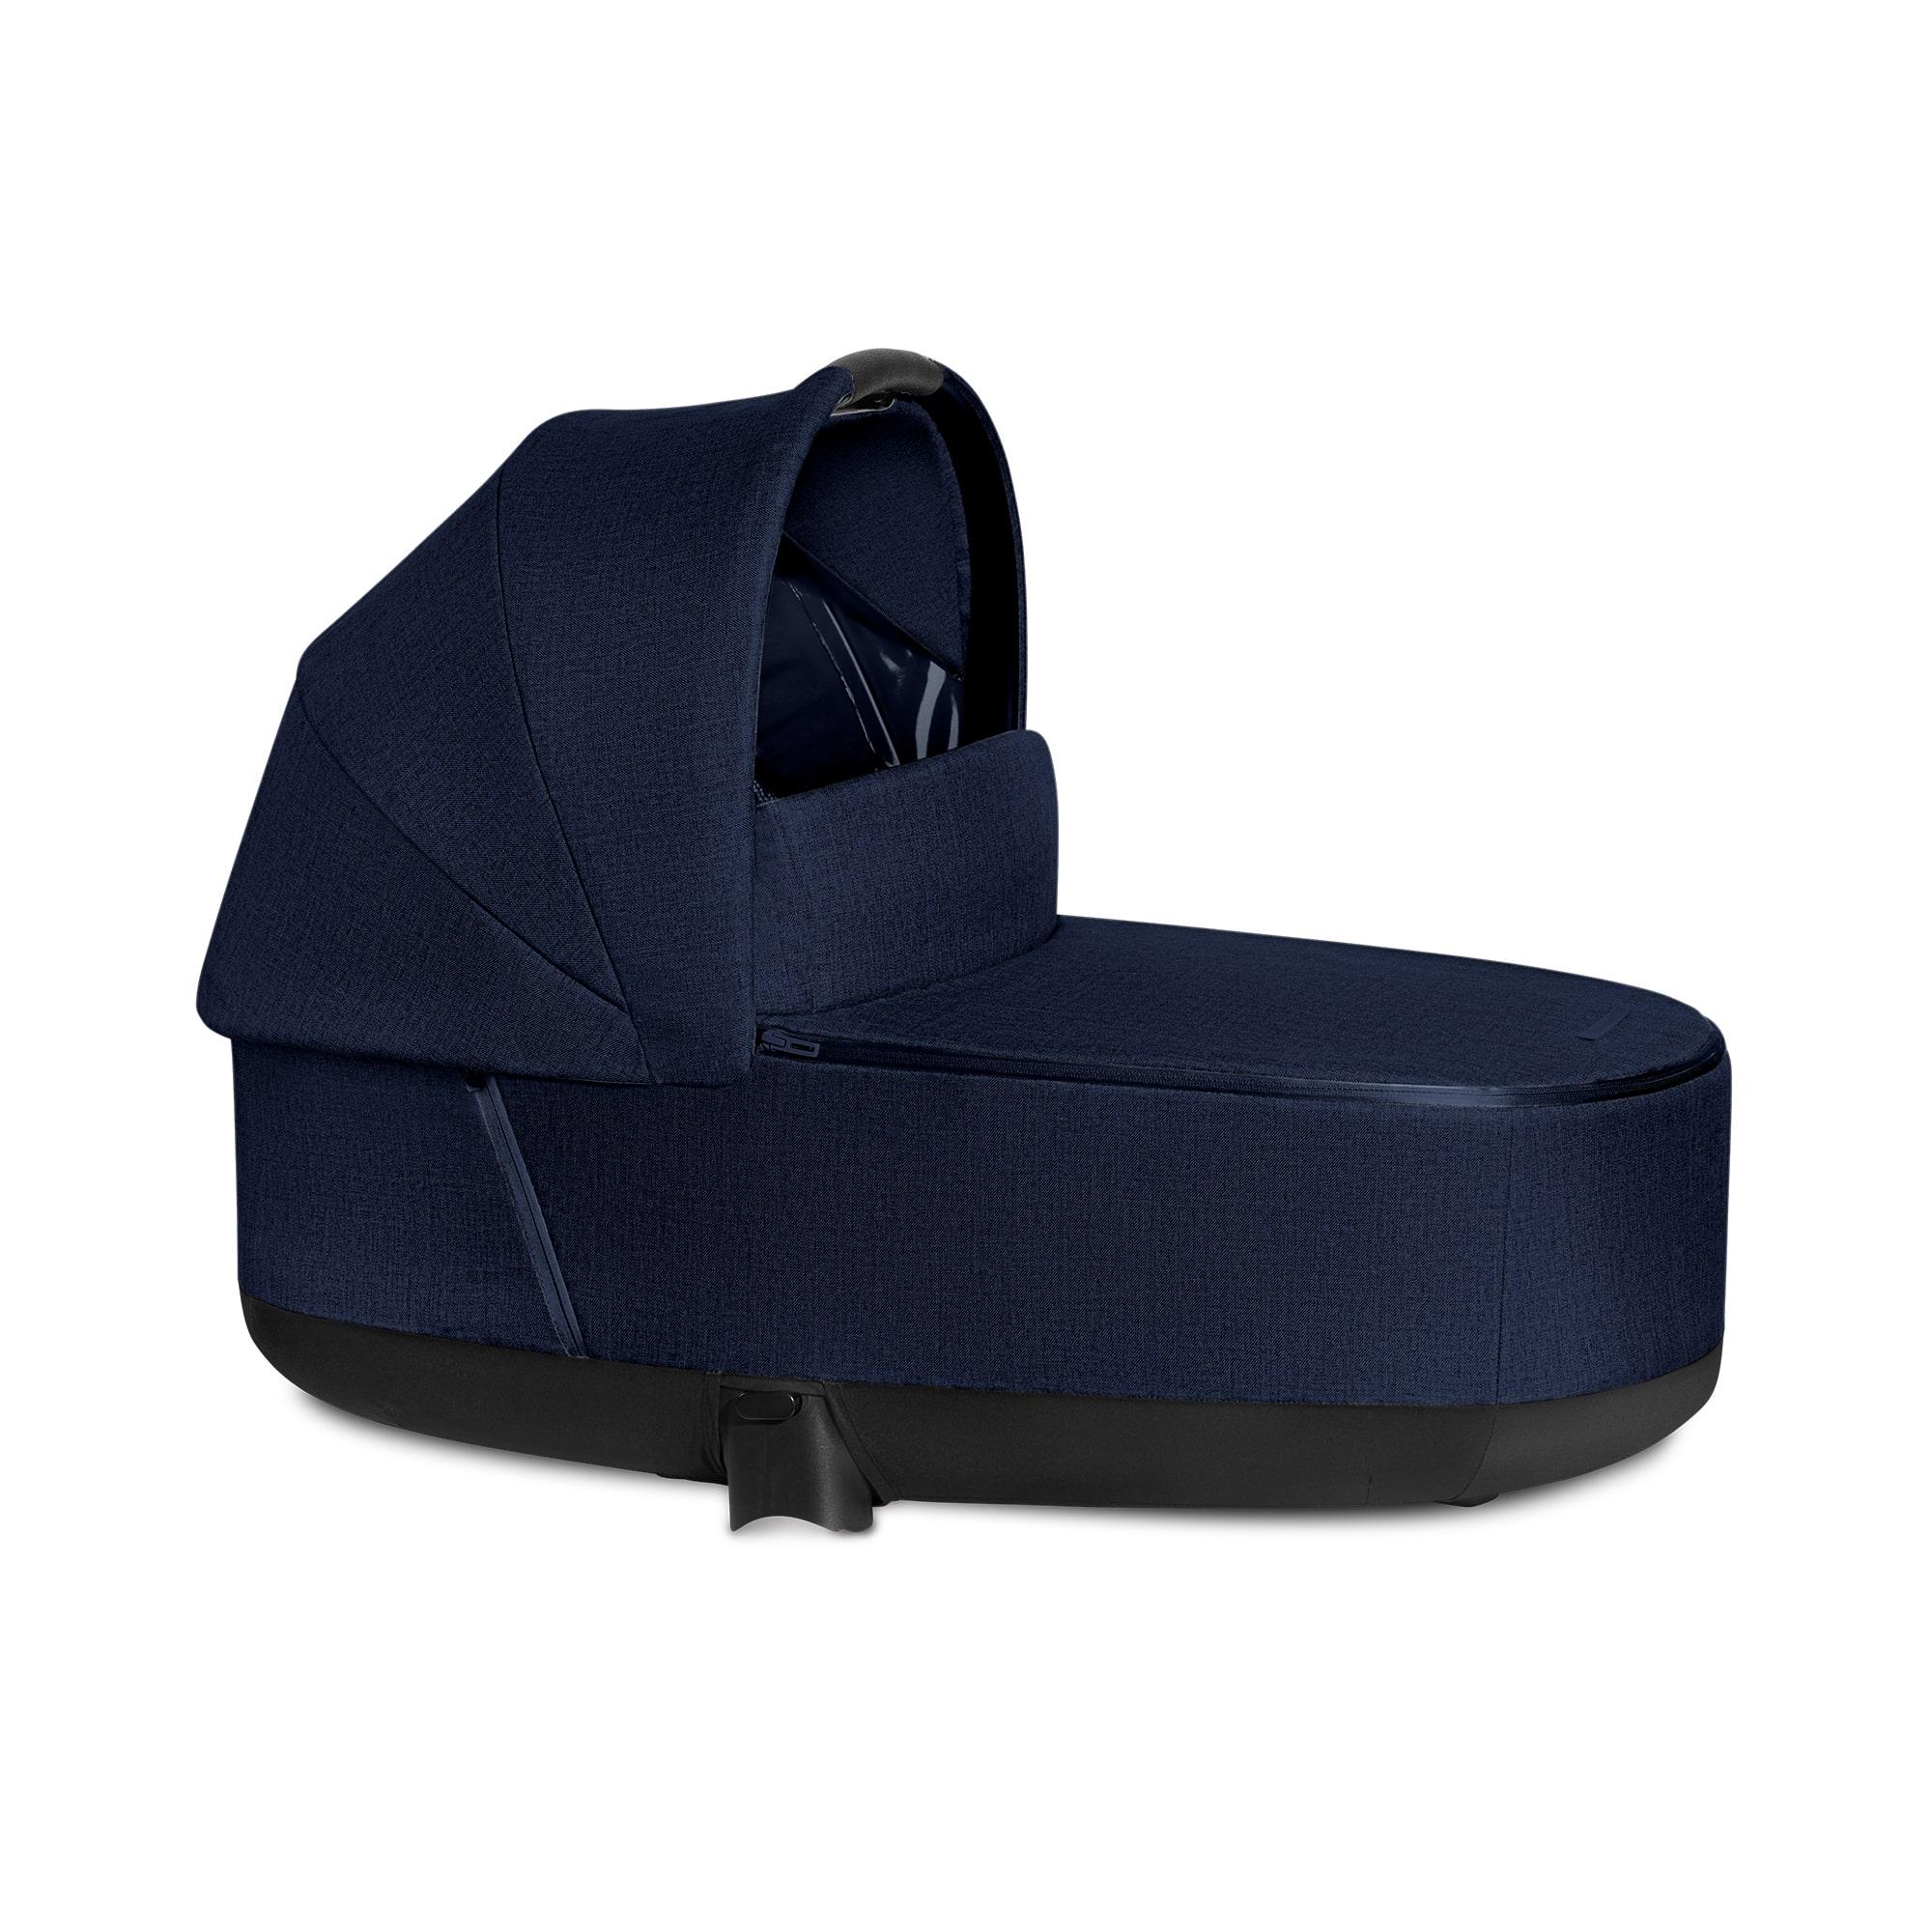 "Cybex Πορτ Μπεμπέ Priam / e-PRIAM PLUS Lux Carry Cot Midnight Blue ""Platinum Collection"""